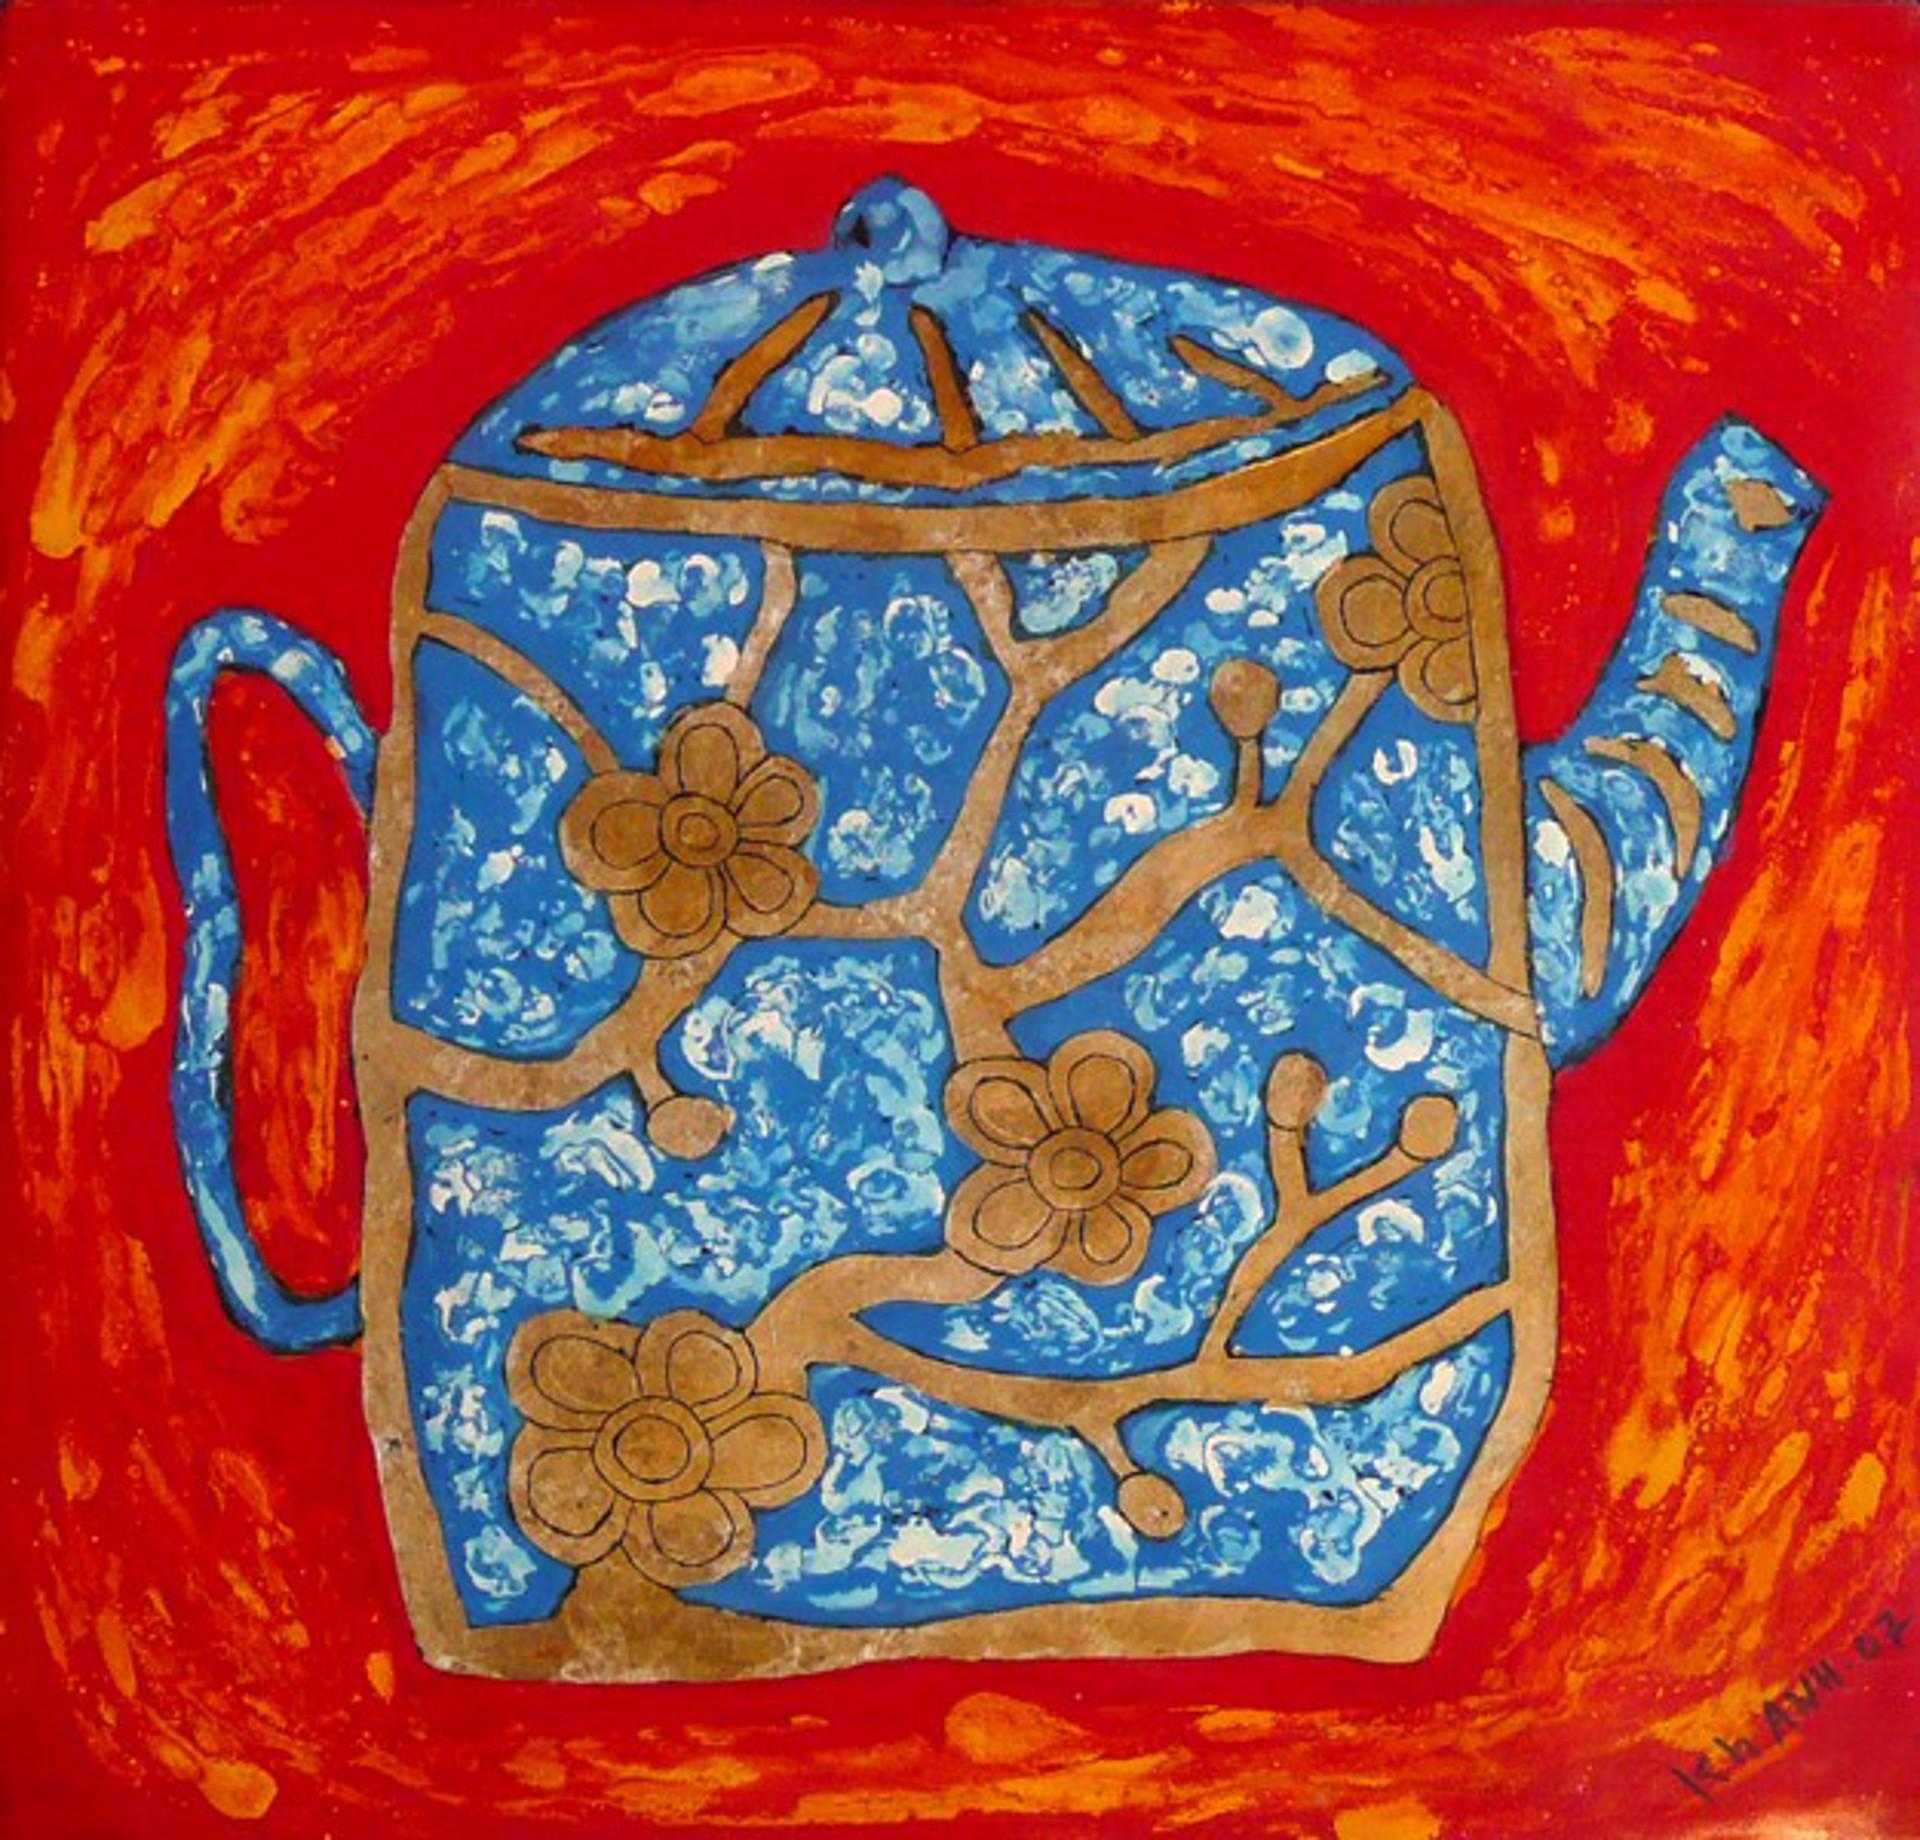 Blue Teapot by Bui Cong Khanh